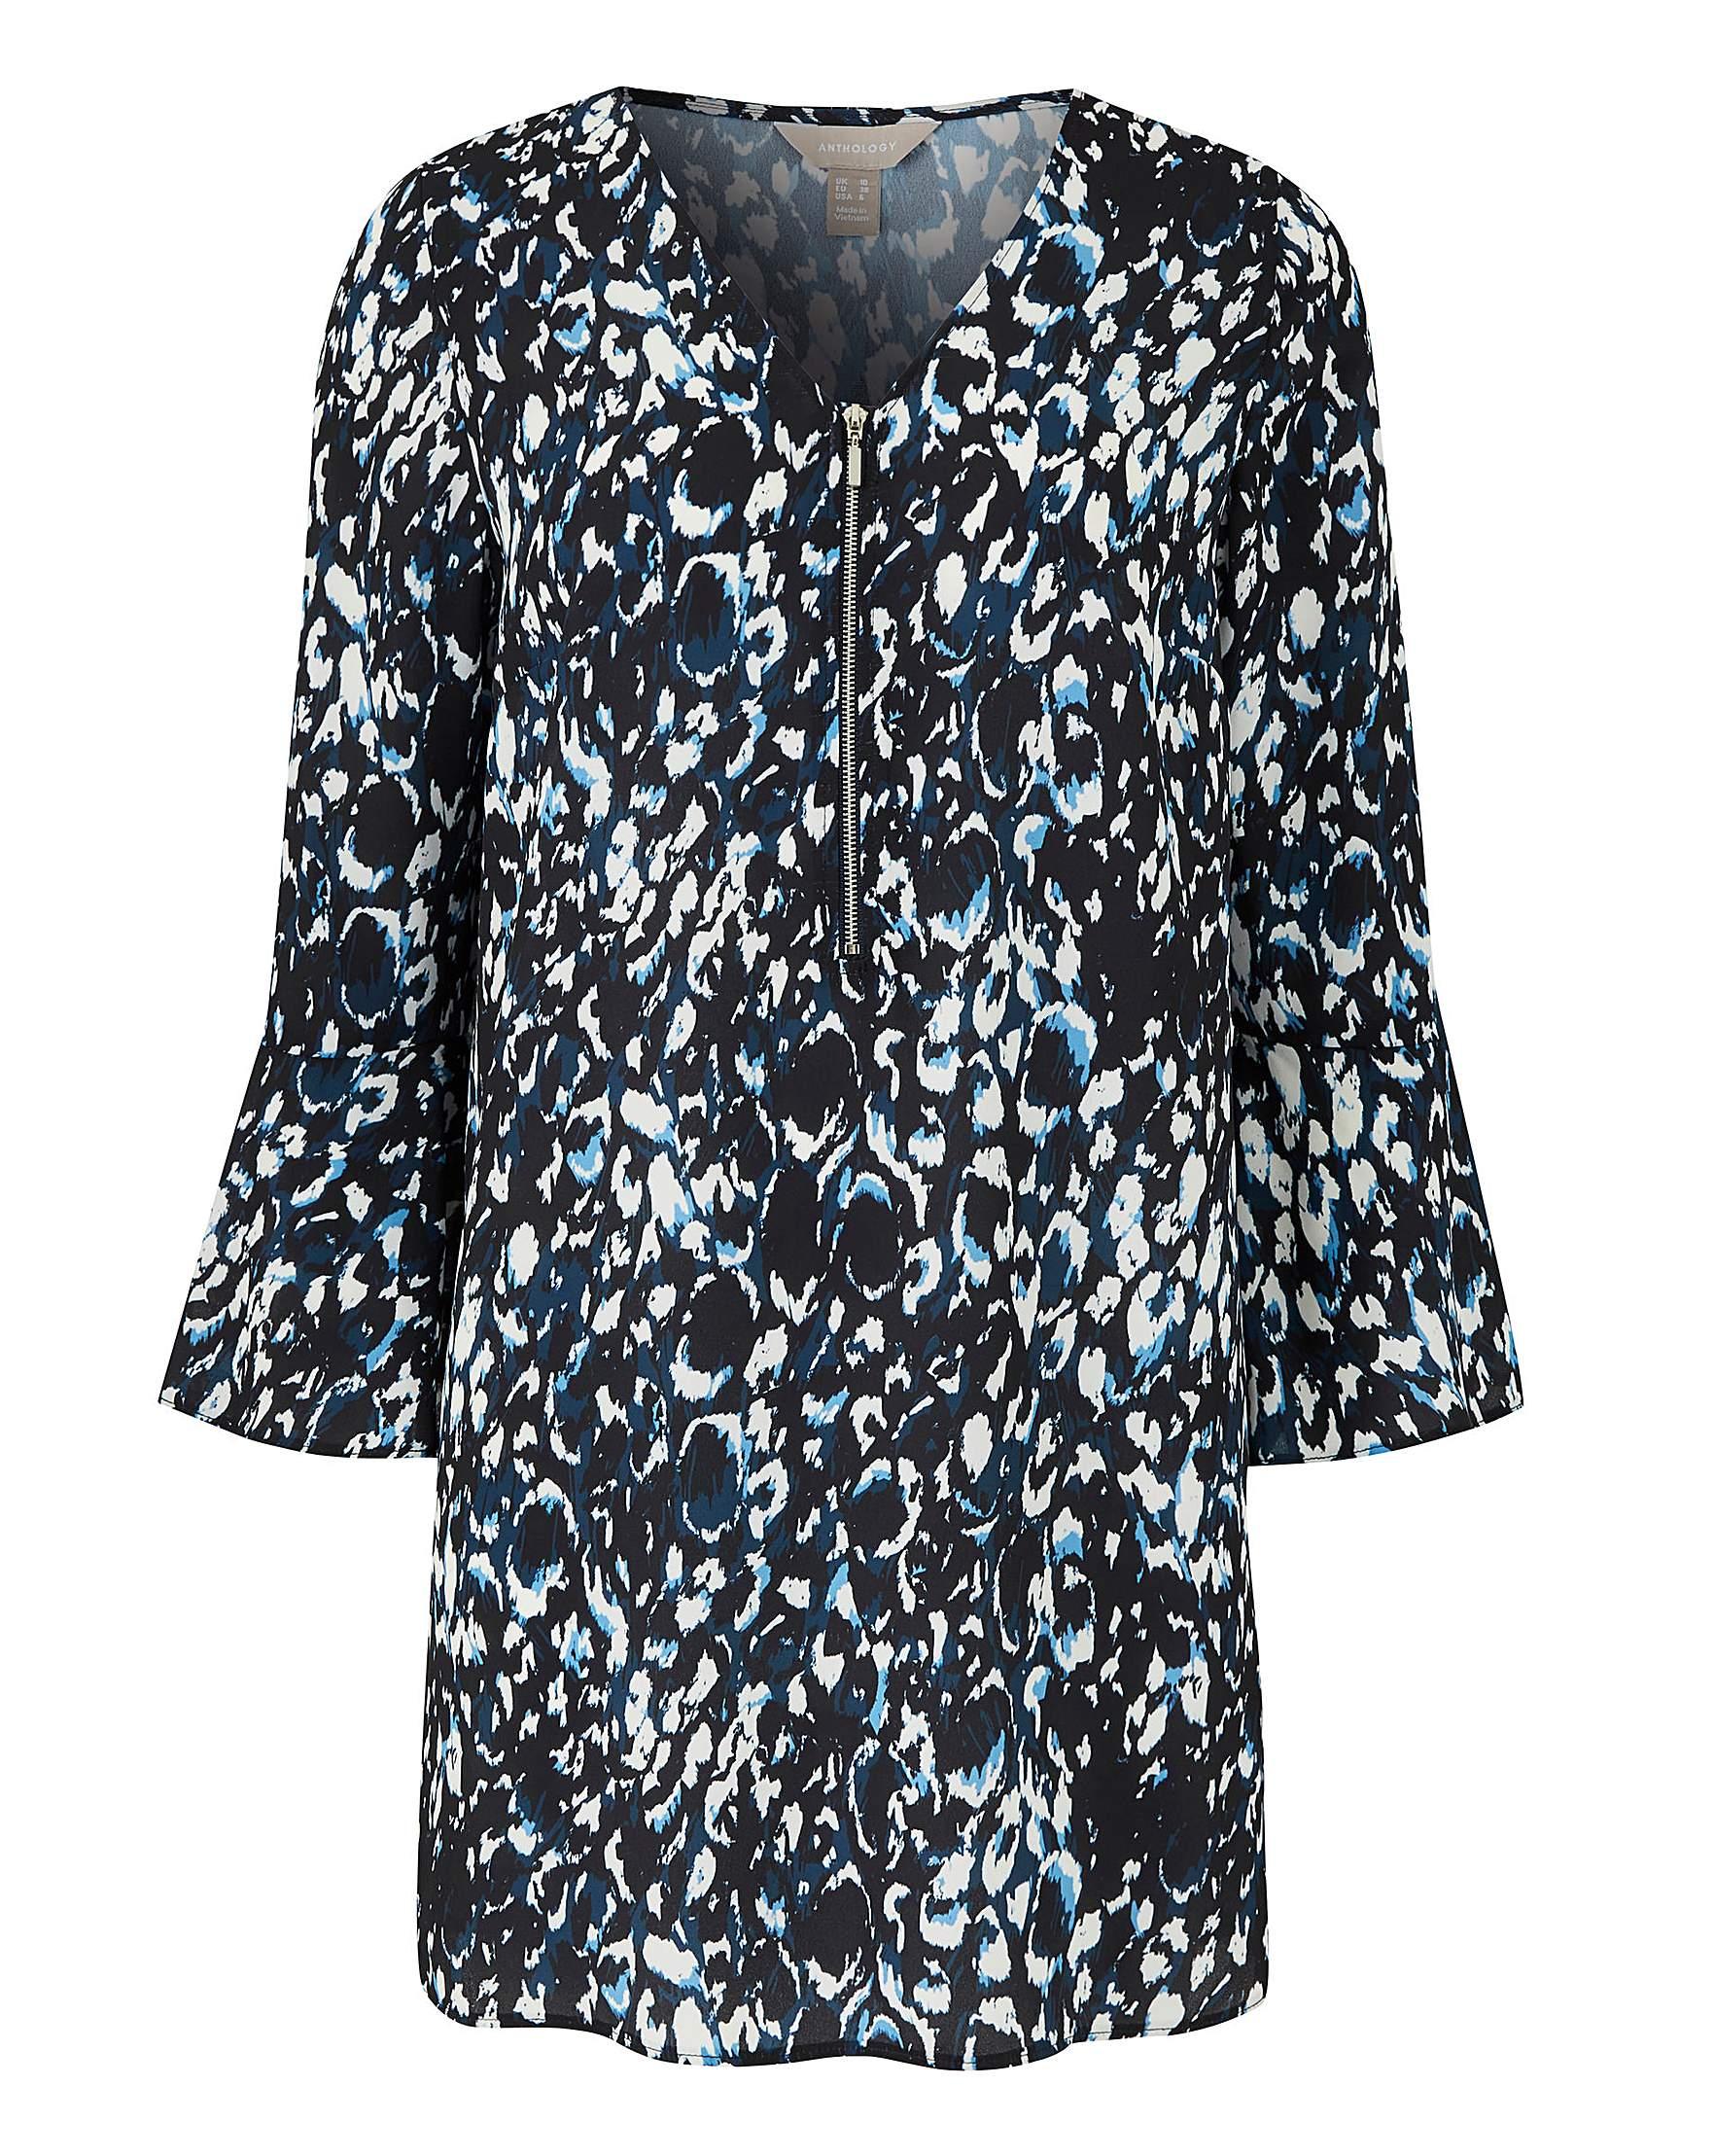 a15c0287f6f0 Blue Animal Print Zip Front Blouse | Fashion World